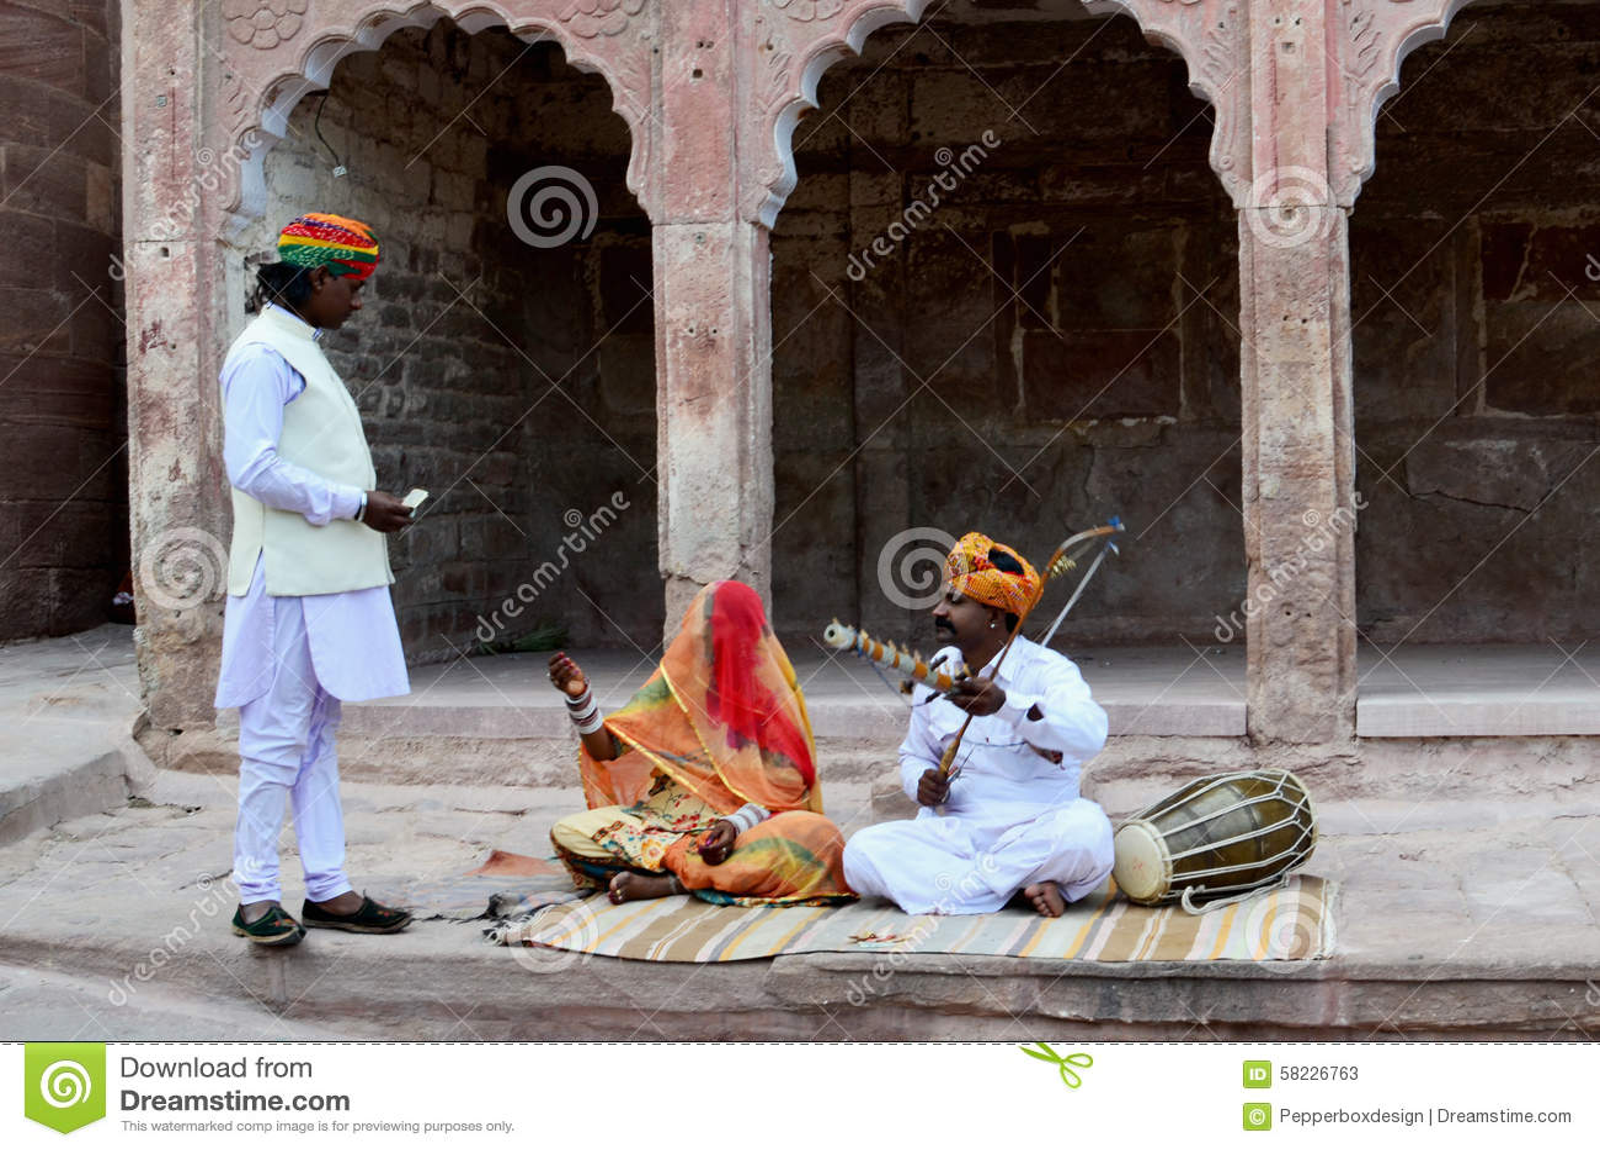 Musicians at Meherangarh Fort, Jodhpur, India